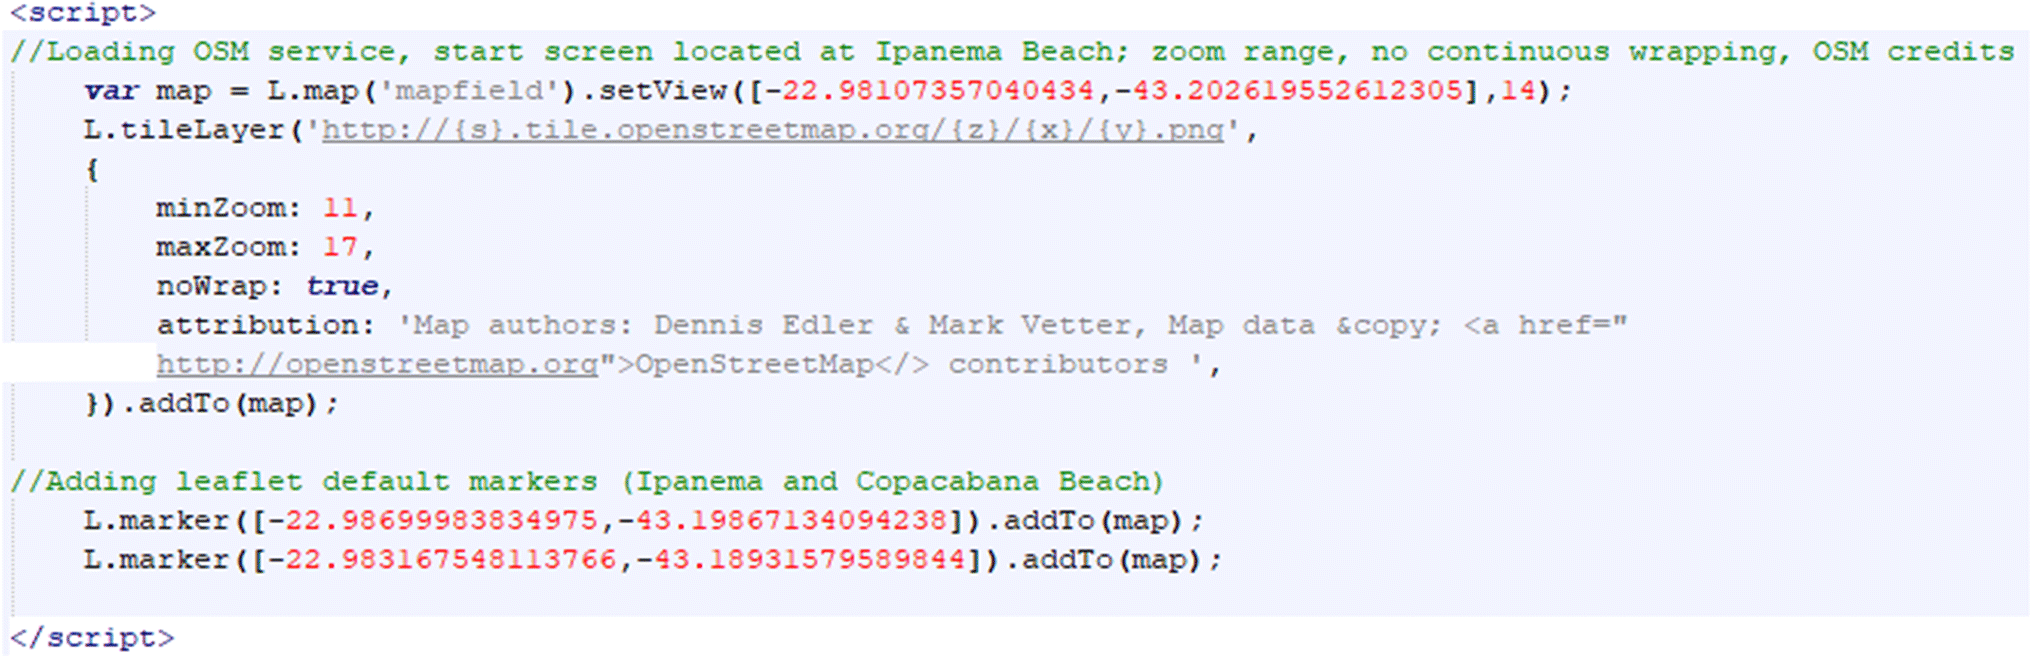 The Simplicity of Modern Audiovisual Web Cartography: An